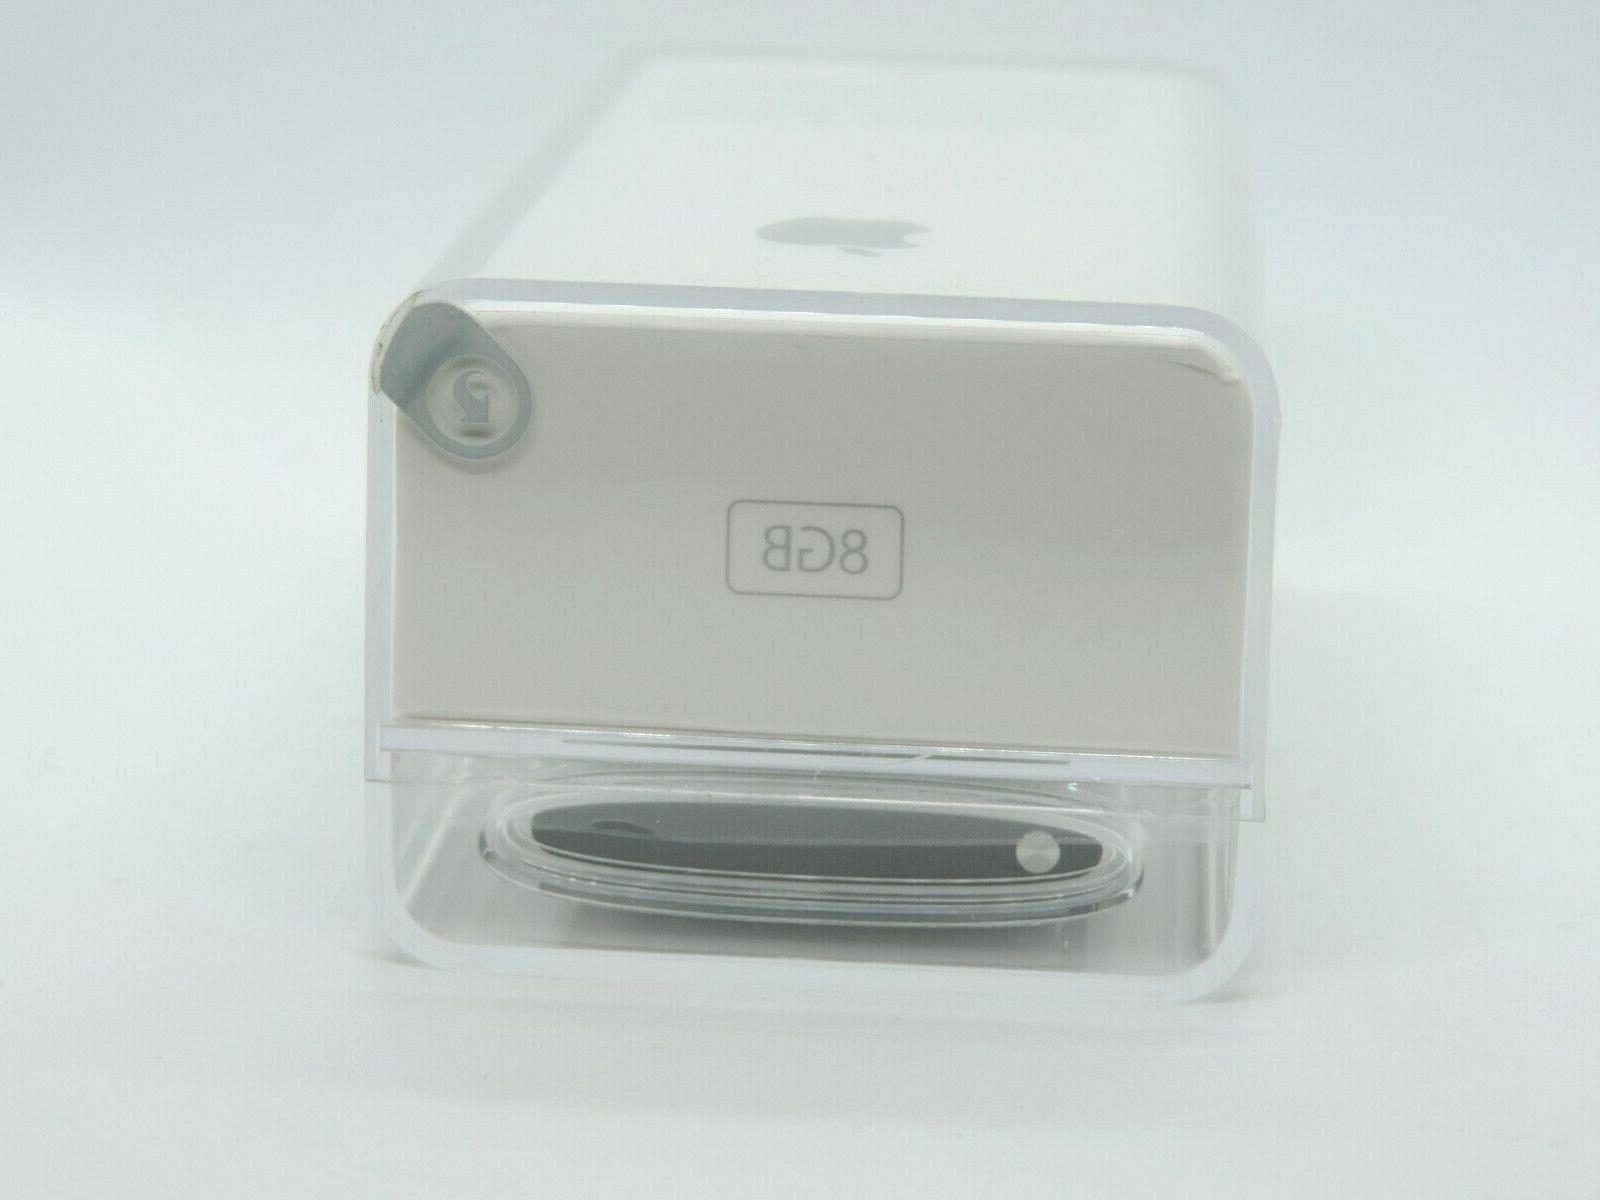 Apple iPod nano Generation Silver MC027LL/A MP3 Player Collectible